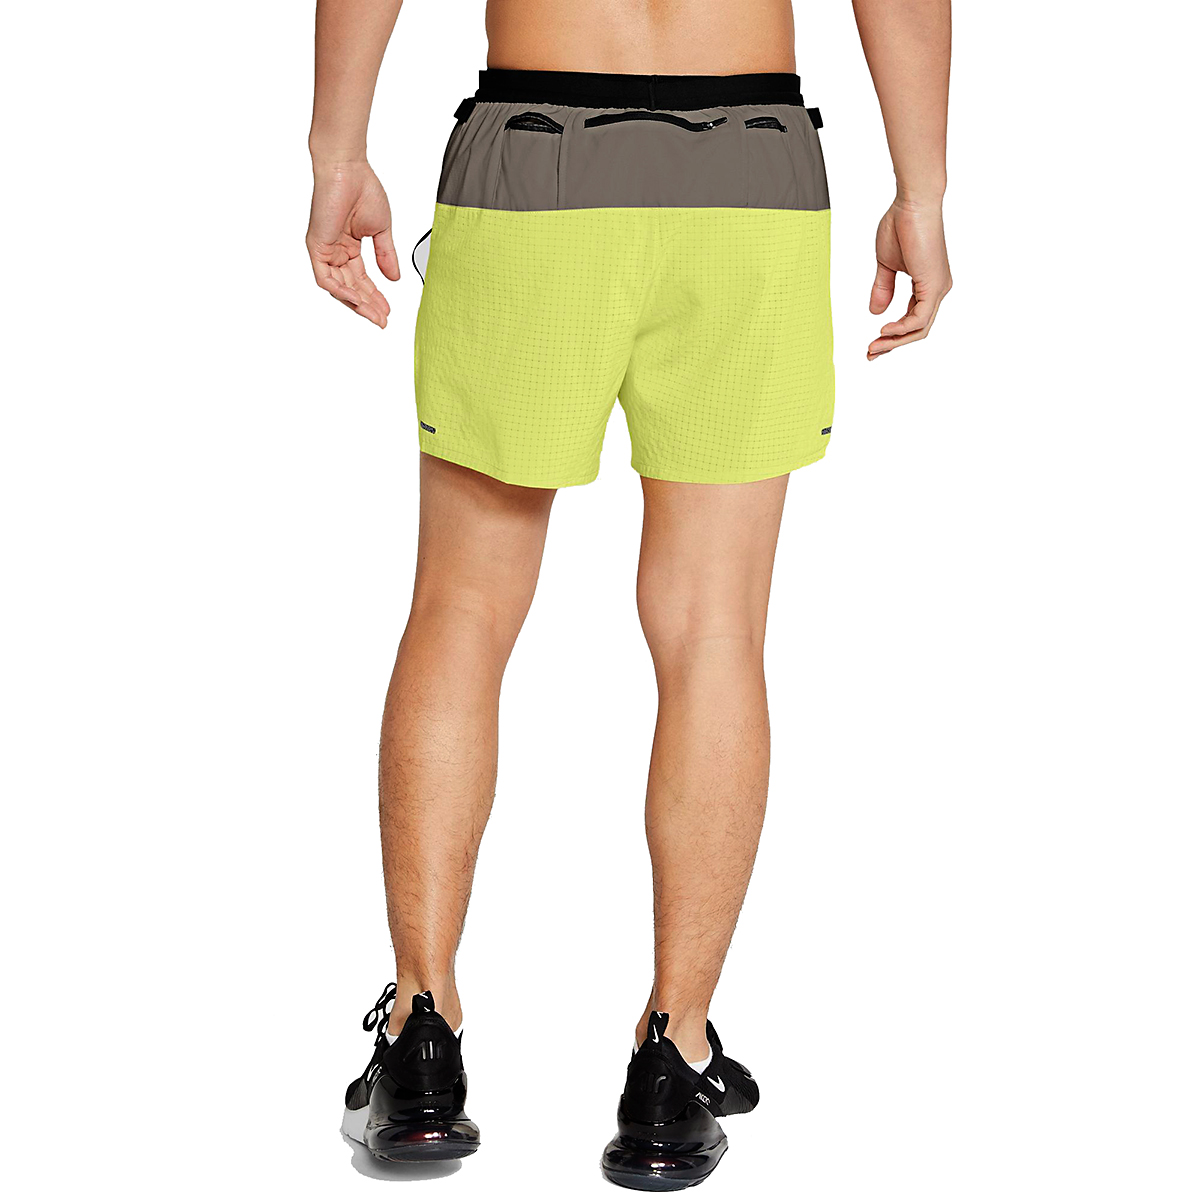 Men's Nike Dri-FIT Flex Stride Trail Shorts - Color: Light Lemon Twist/Moon Fossil/Bright Spruce - Size: S, Light Lemon Twist/Moon Fossil/Bright Spruce, large, image 2